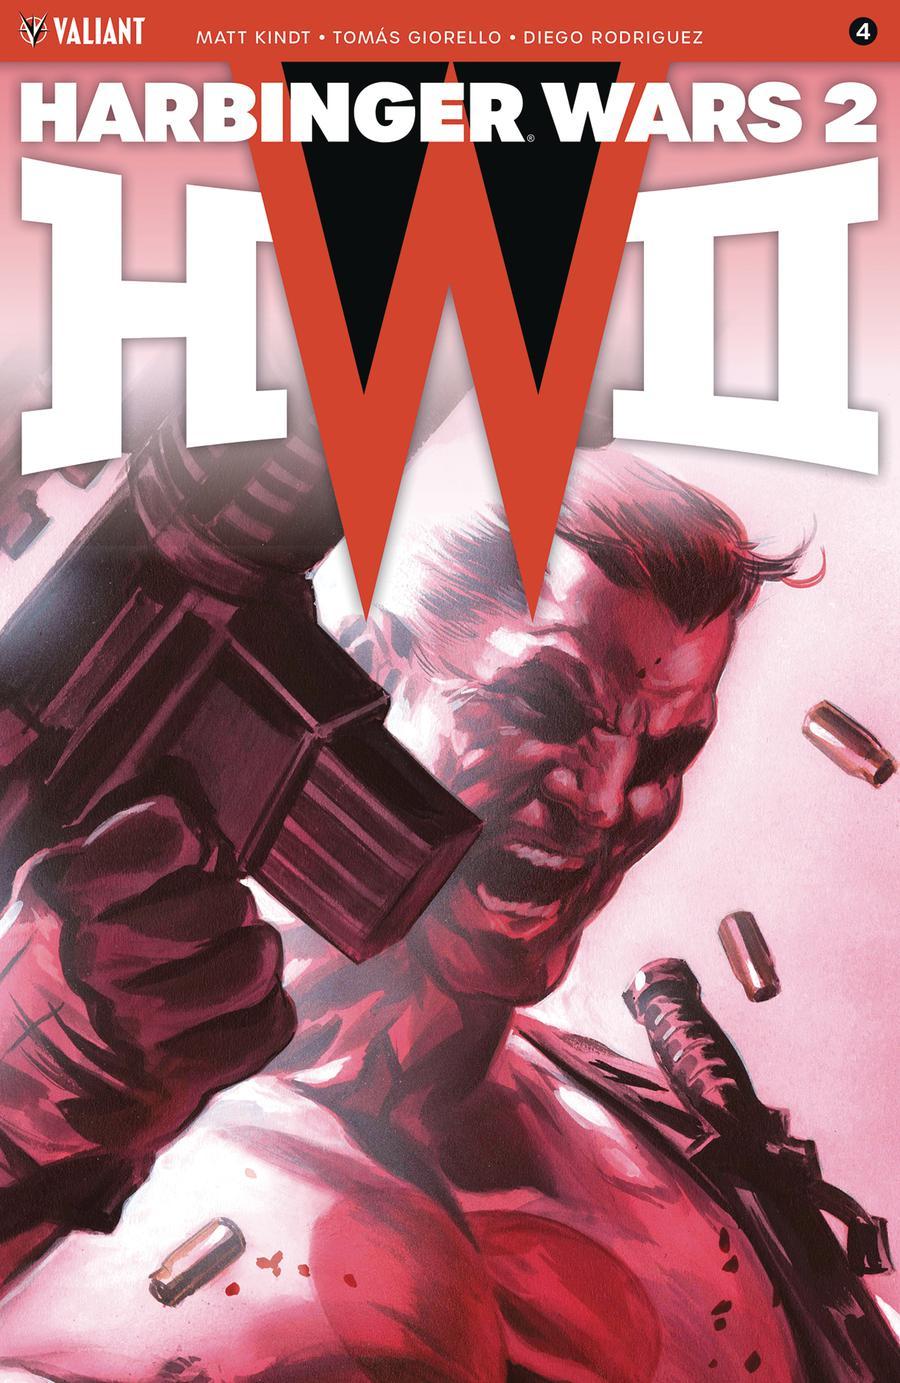 Harbinger Wars 2 #4 Cover E Incentive Felipe Massafera Harbinger Wars 2 Icon Variant Cover